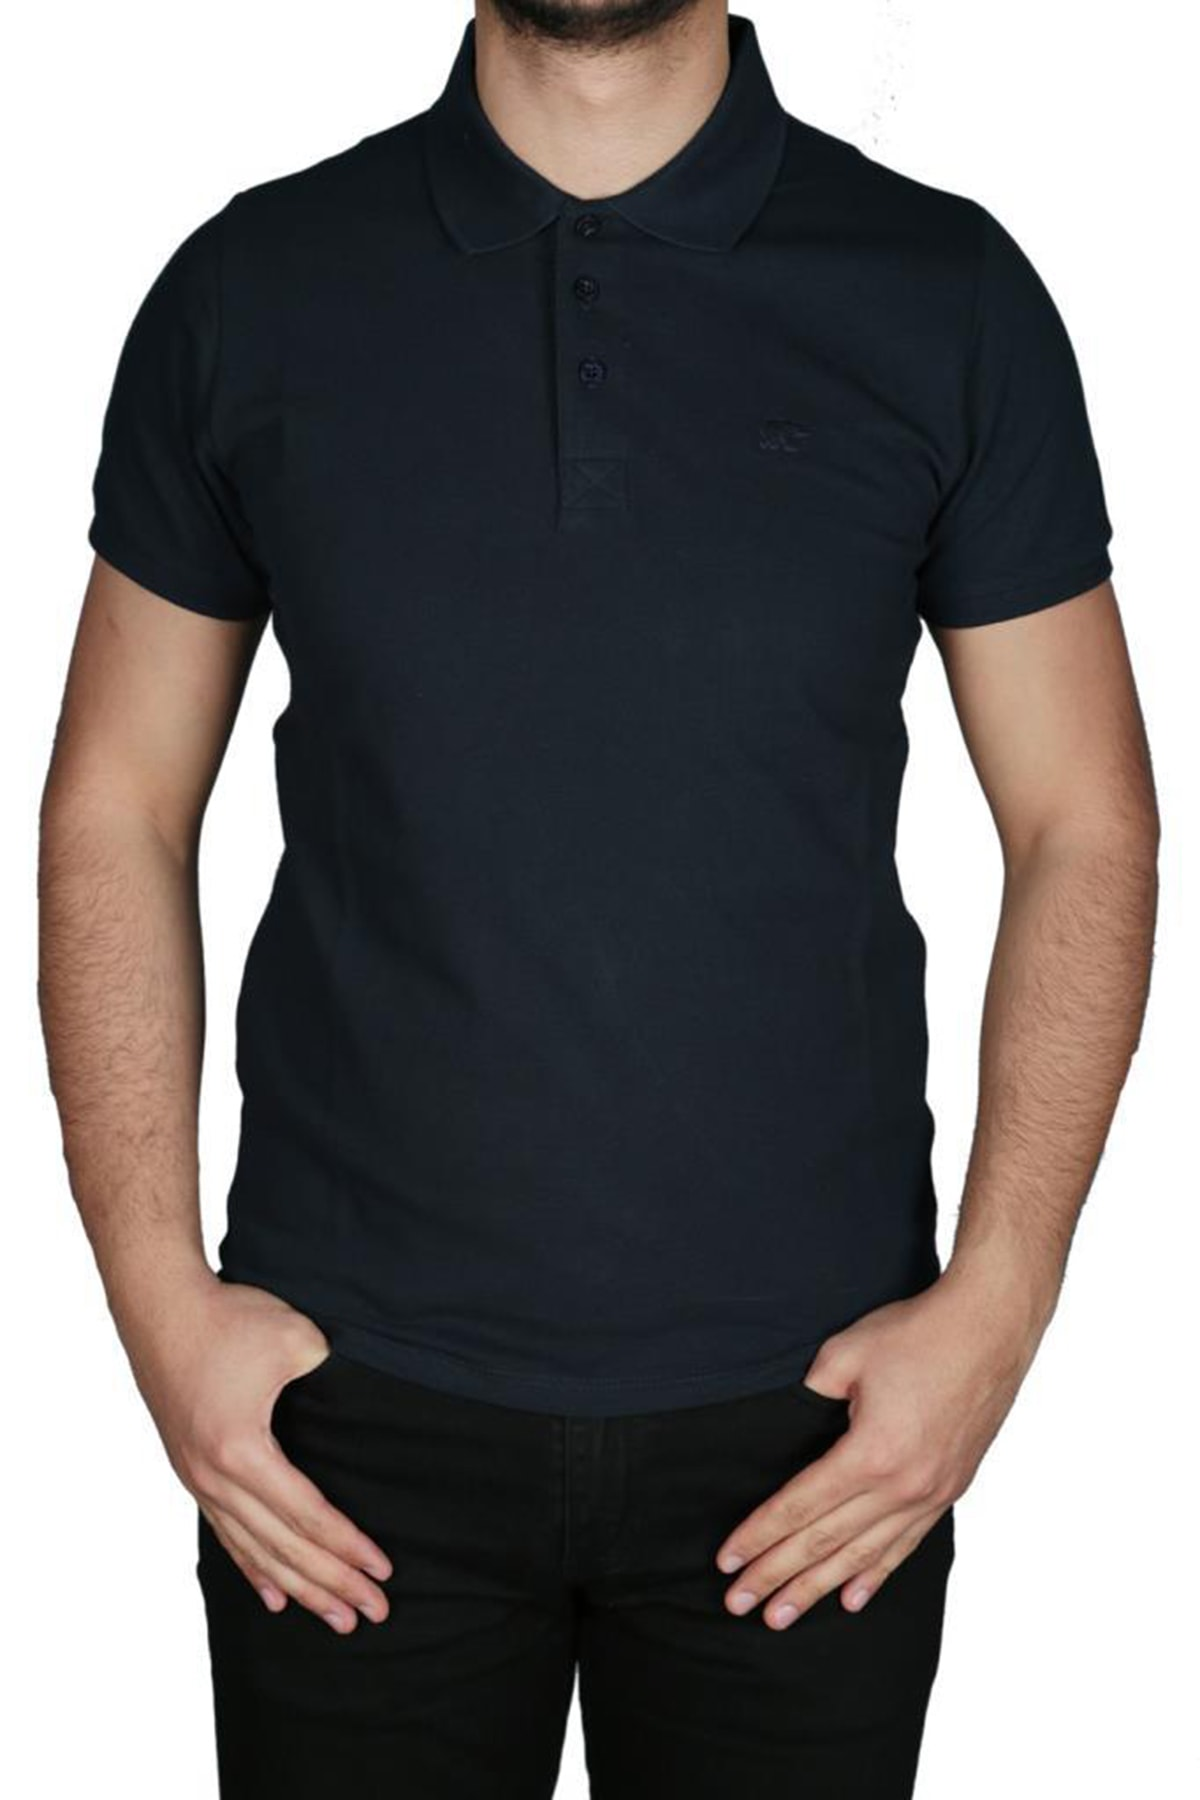 LACIVERT Erkek T-Shirt 18.01.07.002